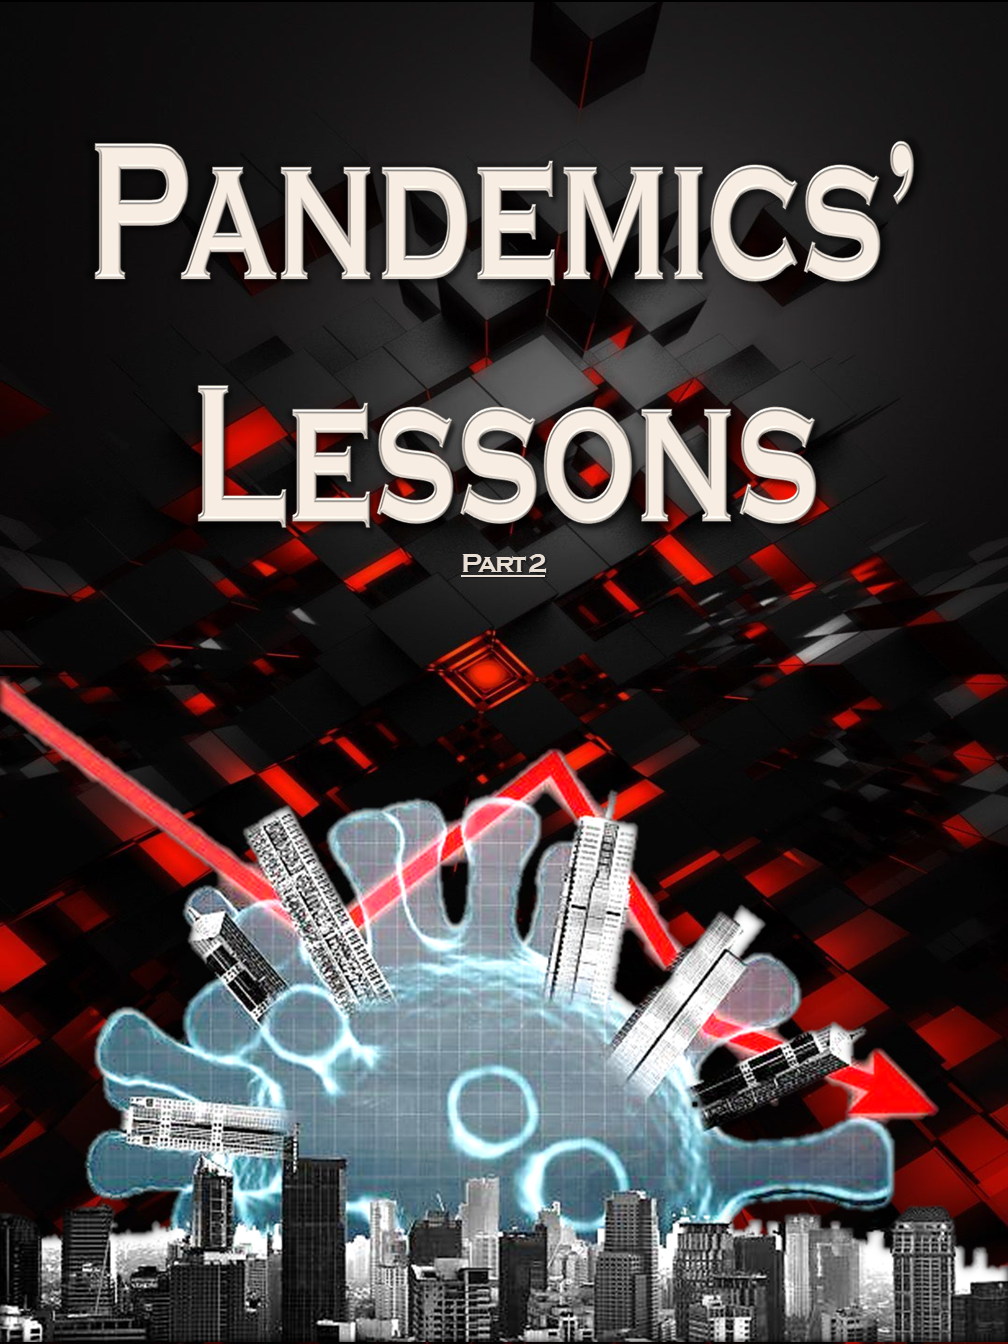 Pandemics' Lessons 2